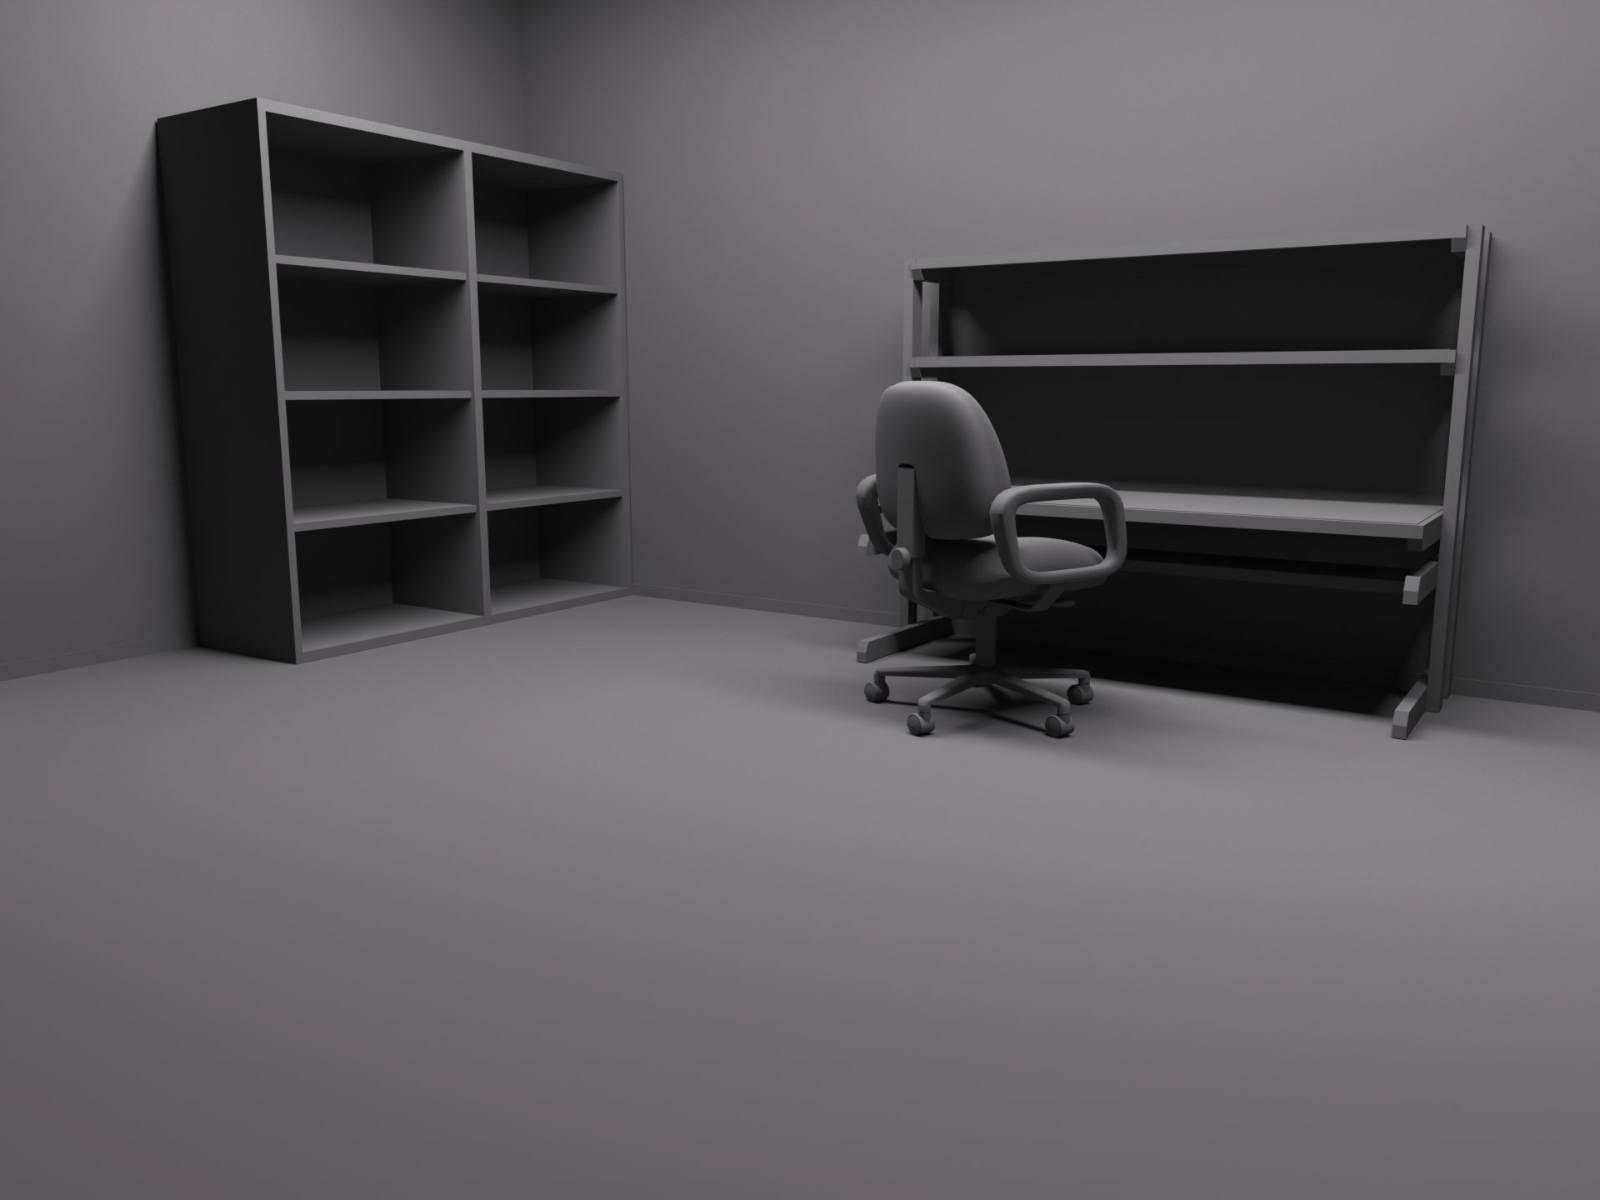 3D Office Desktop Backgrounds,Pictures,Photos,Wallpapers